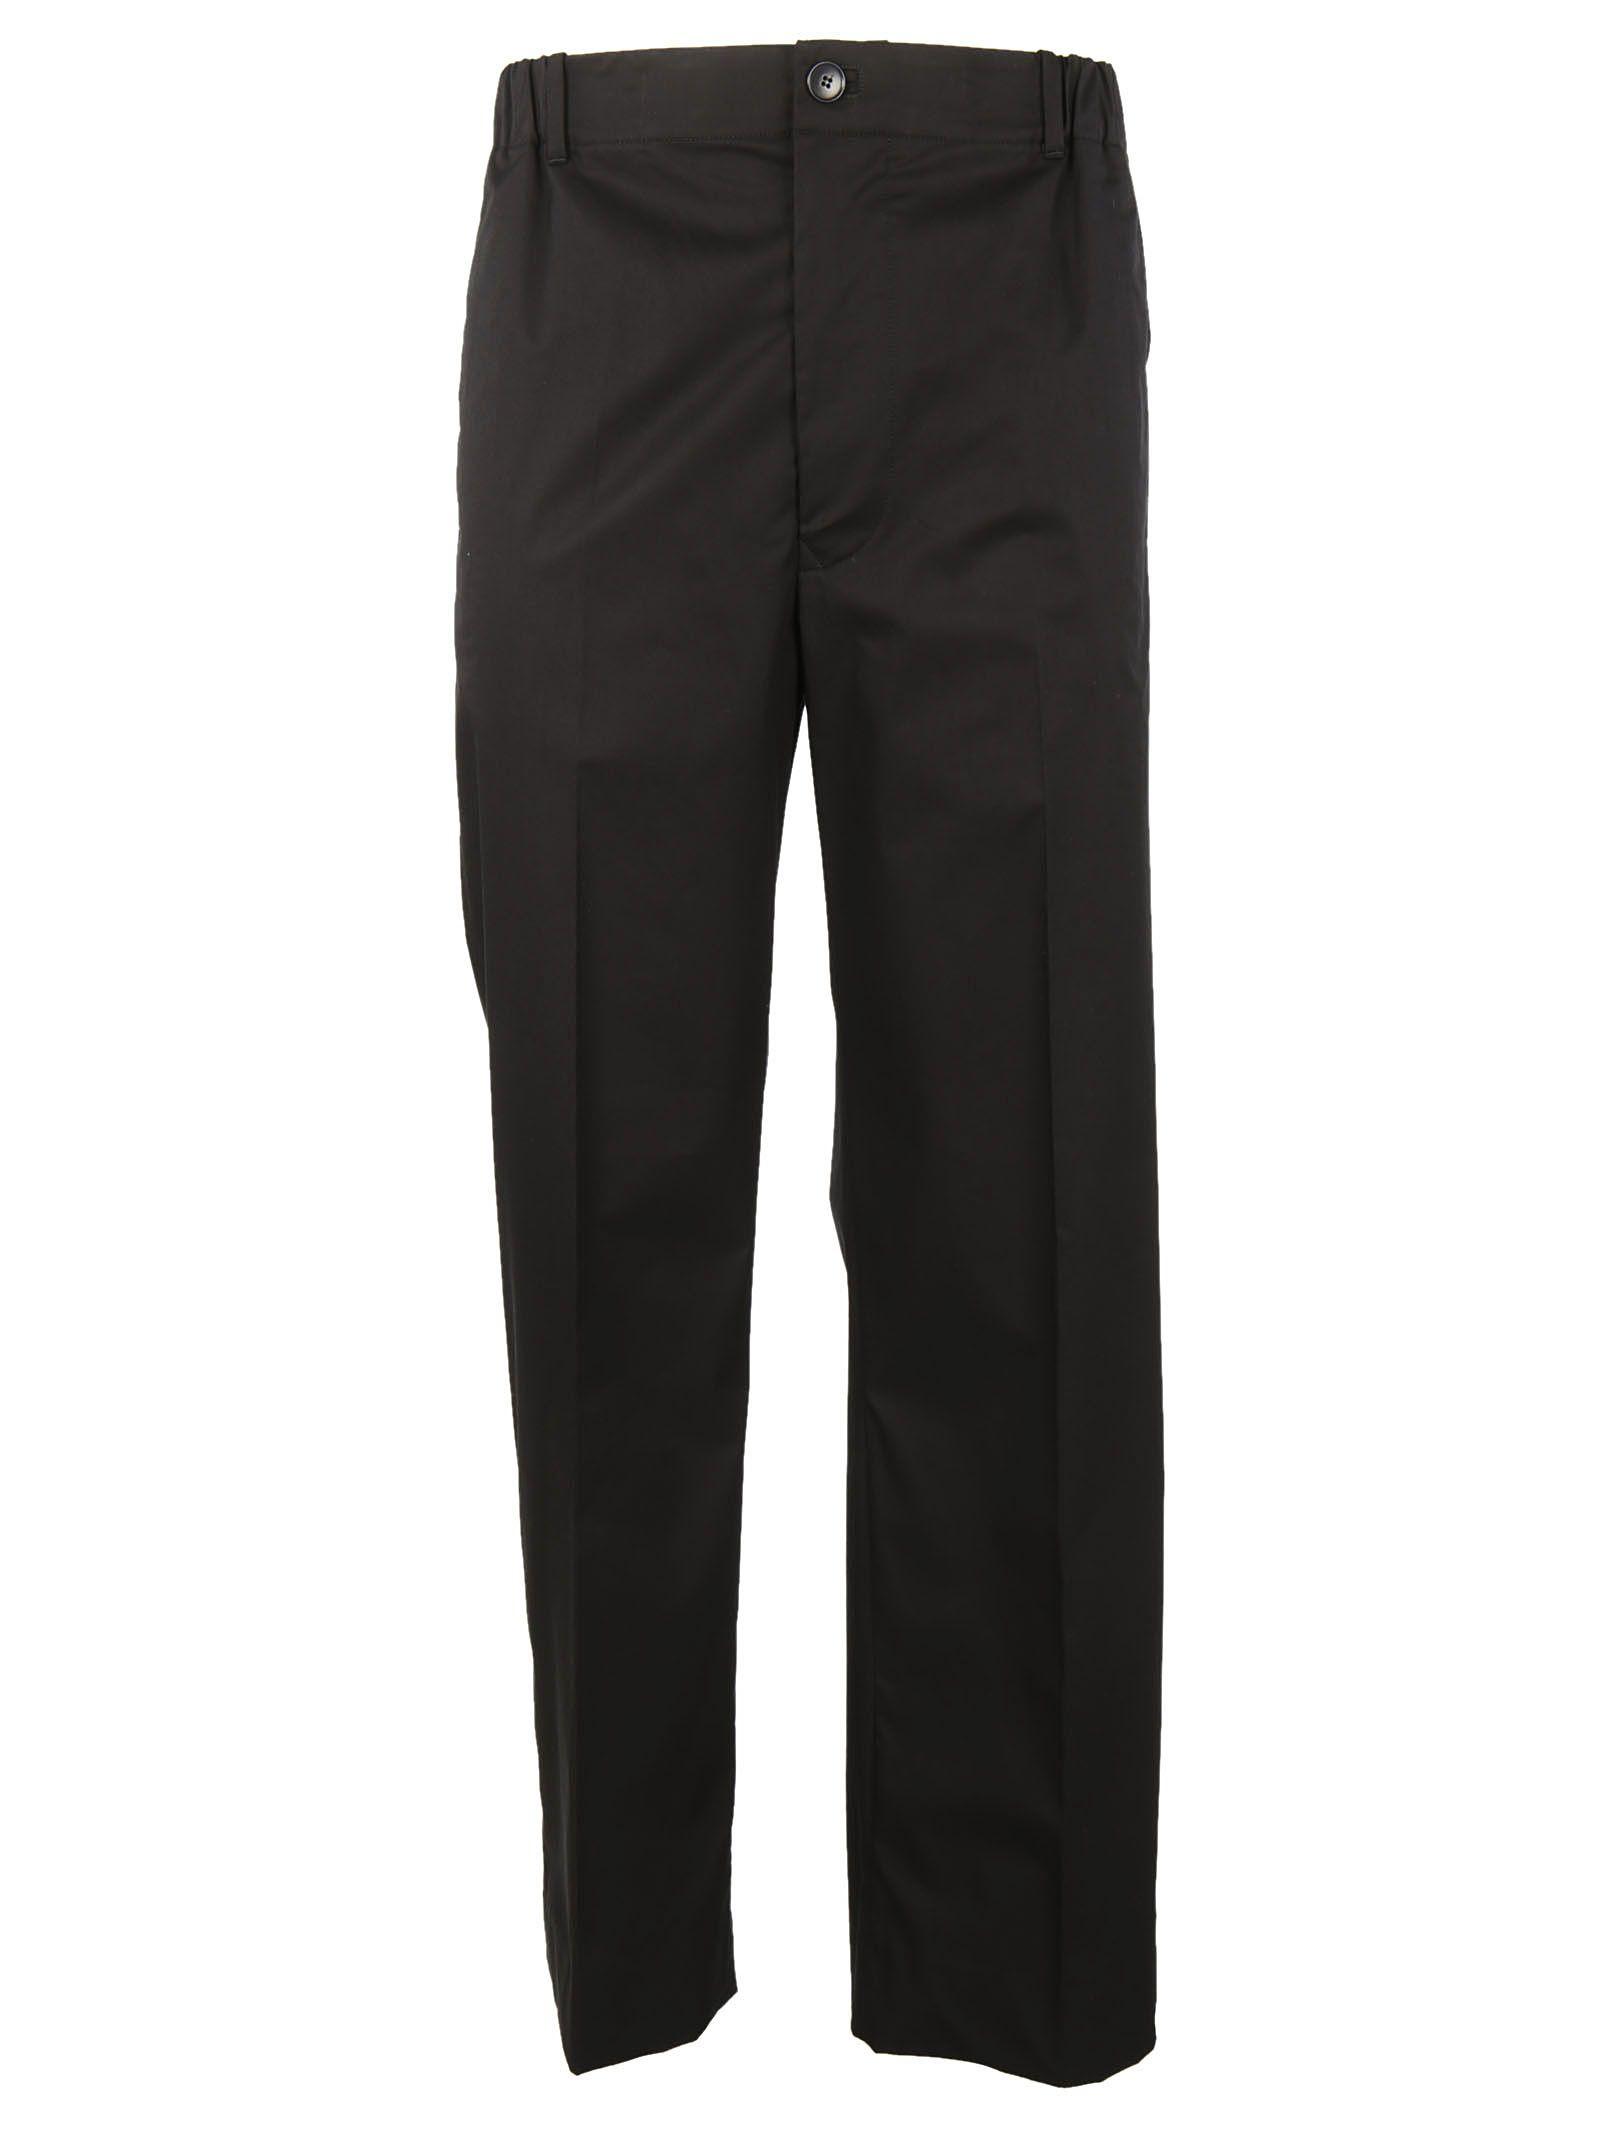 Stella Mccartney Wide Leg Tailored Trousers